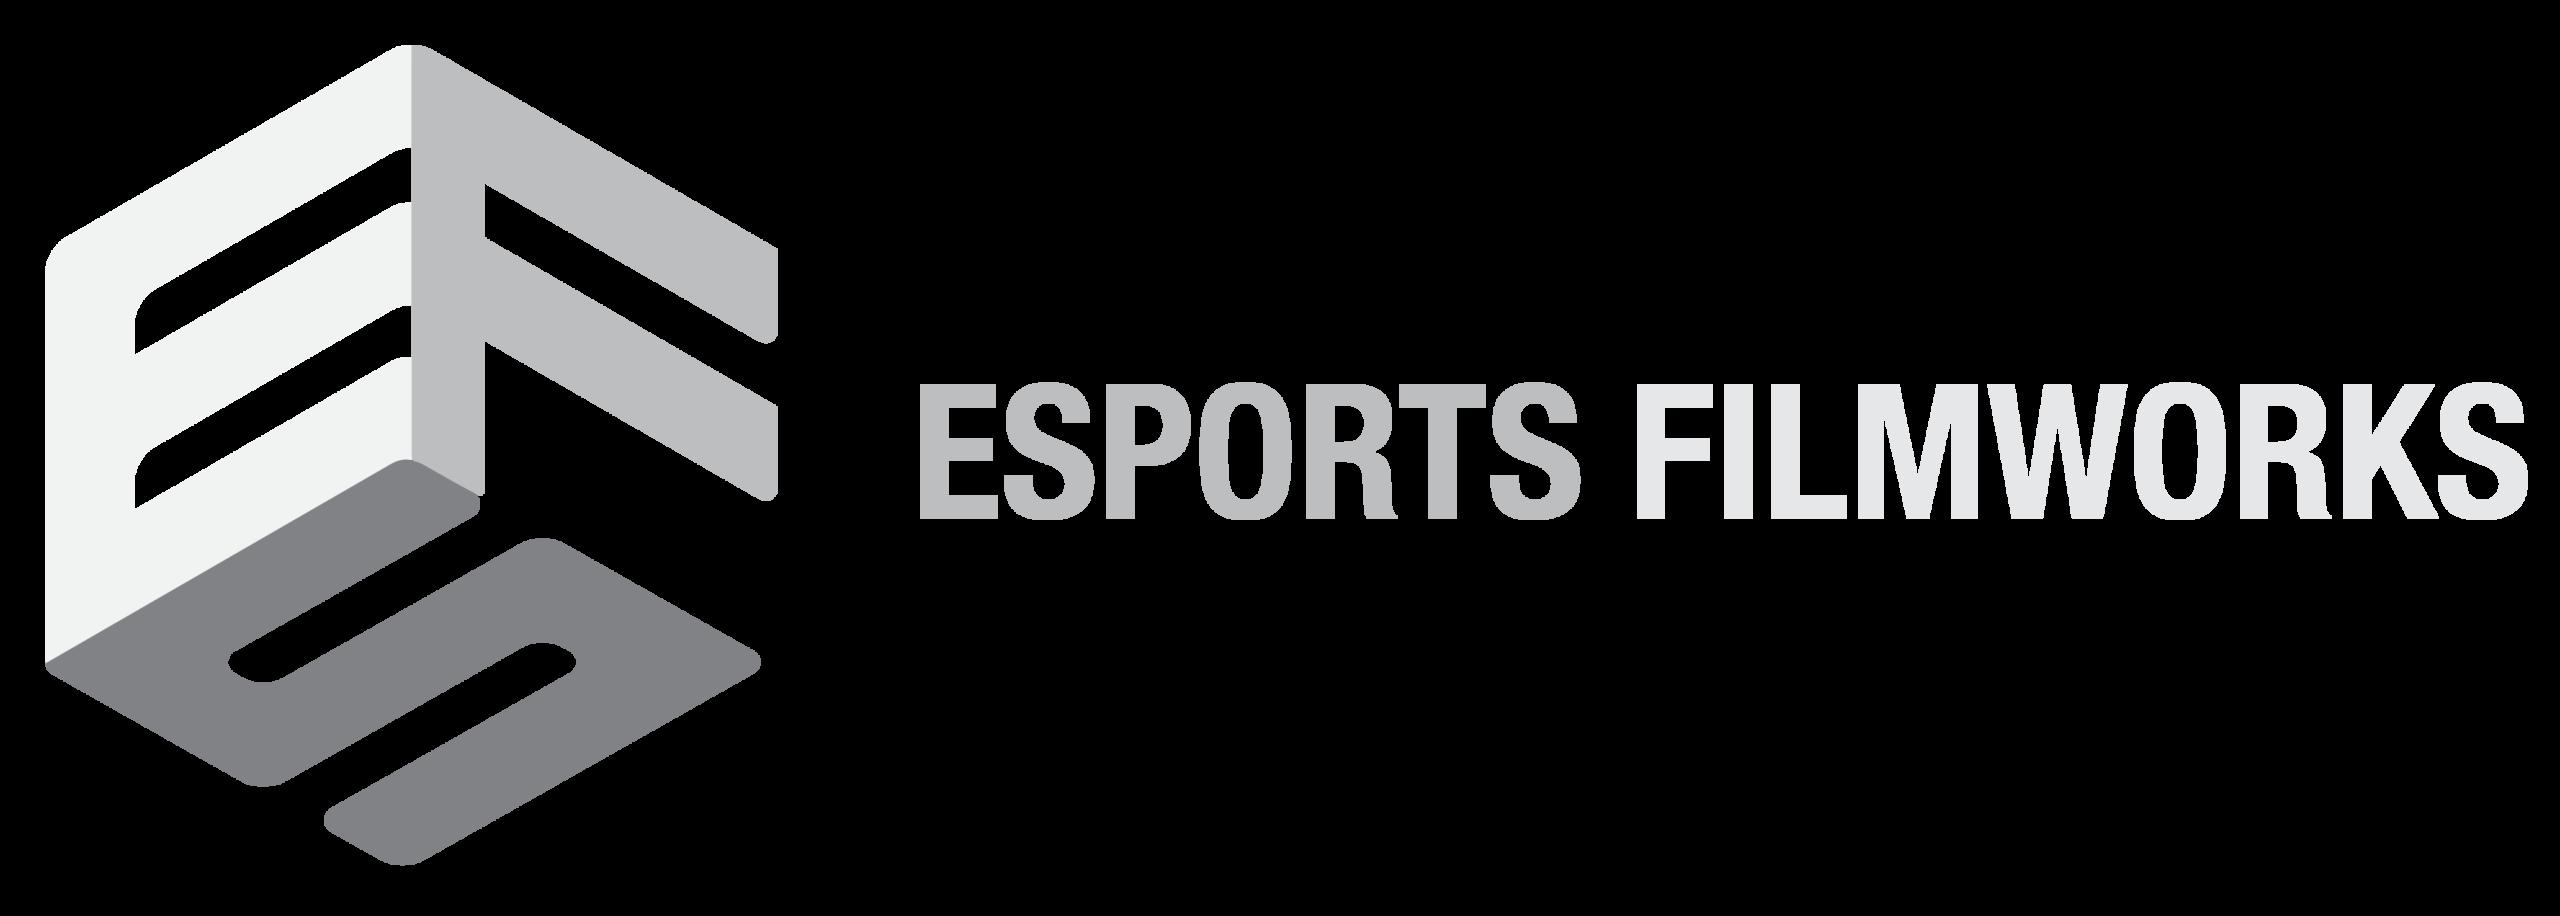 eSports Film Works